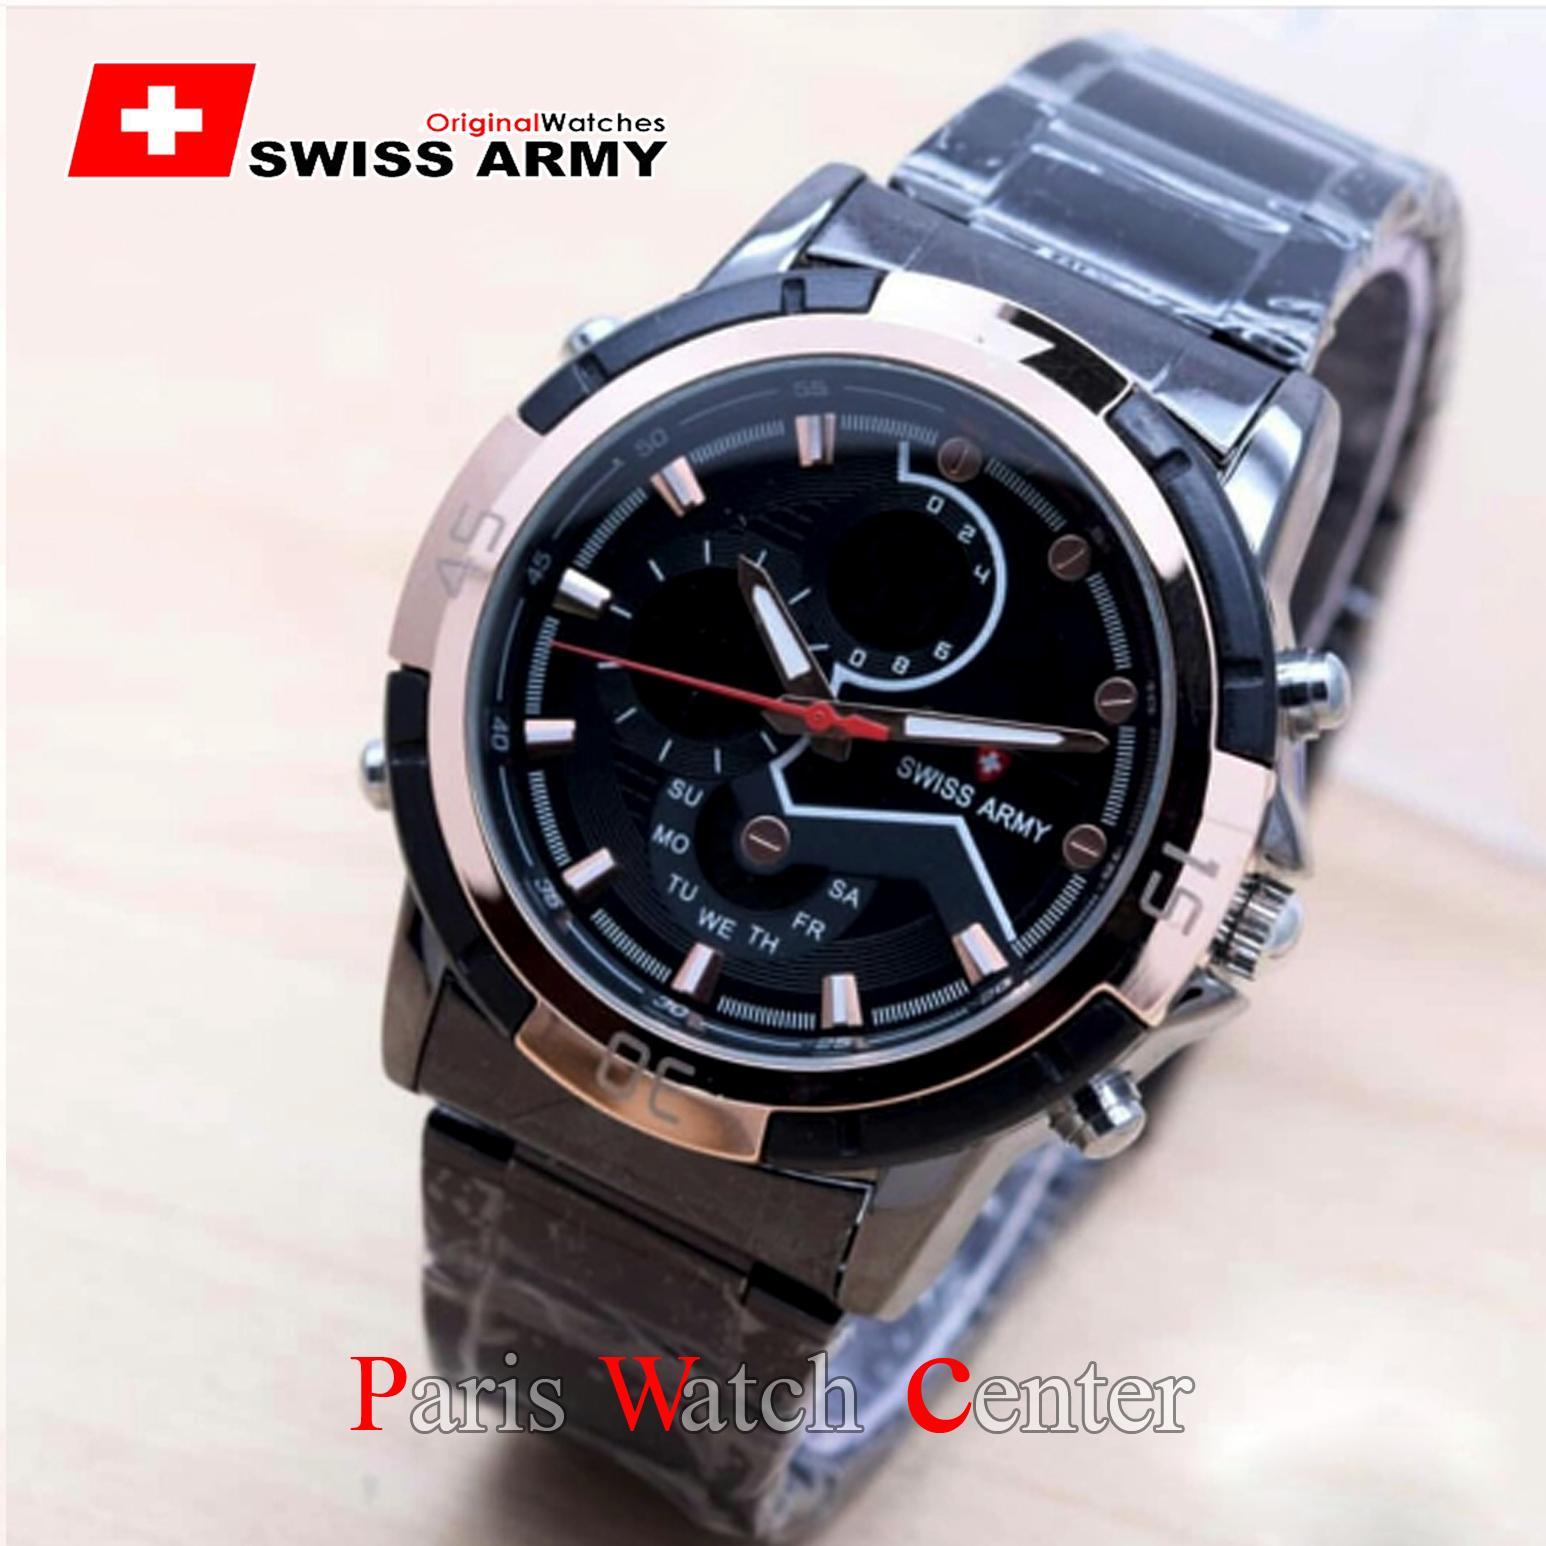 Swiss Army Dual Time Jam Tangan Pria Jam Tangan Trendy Jam Fashionable